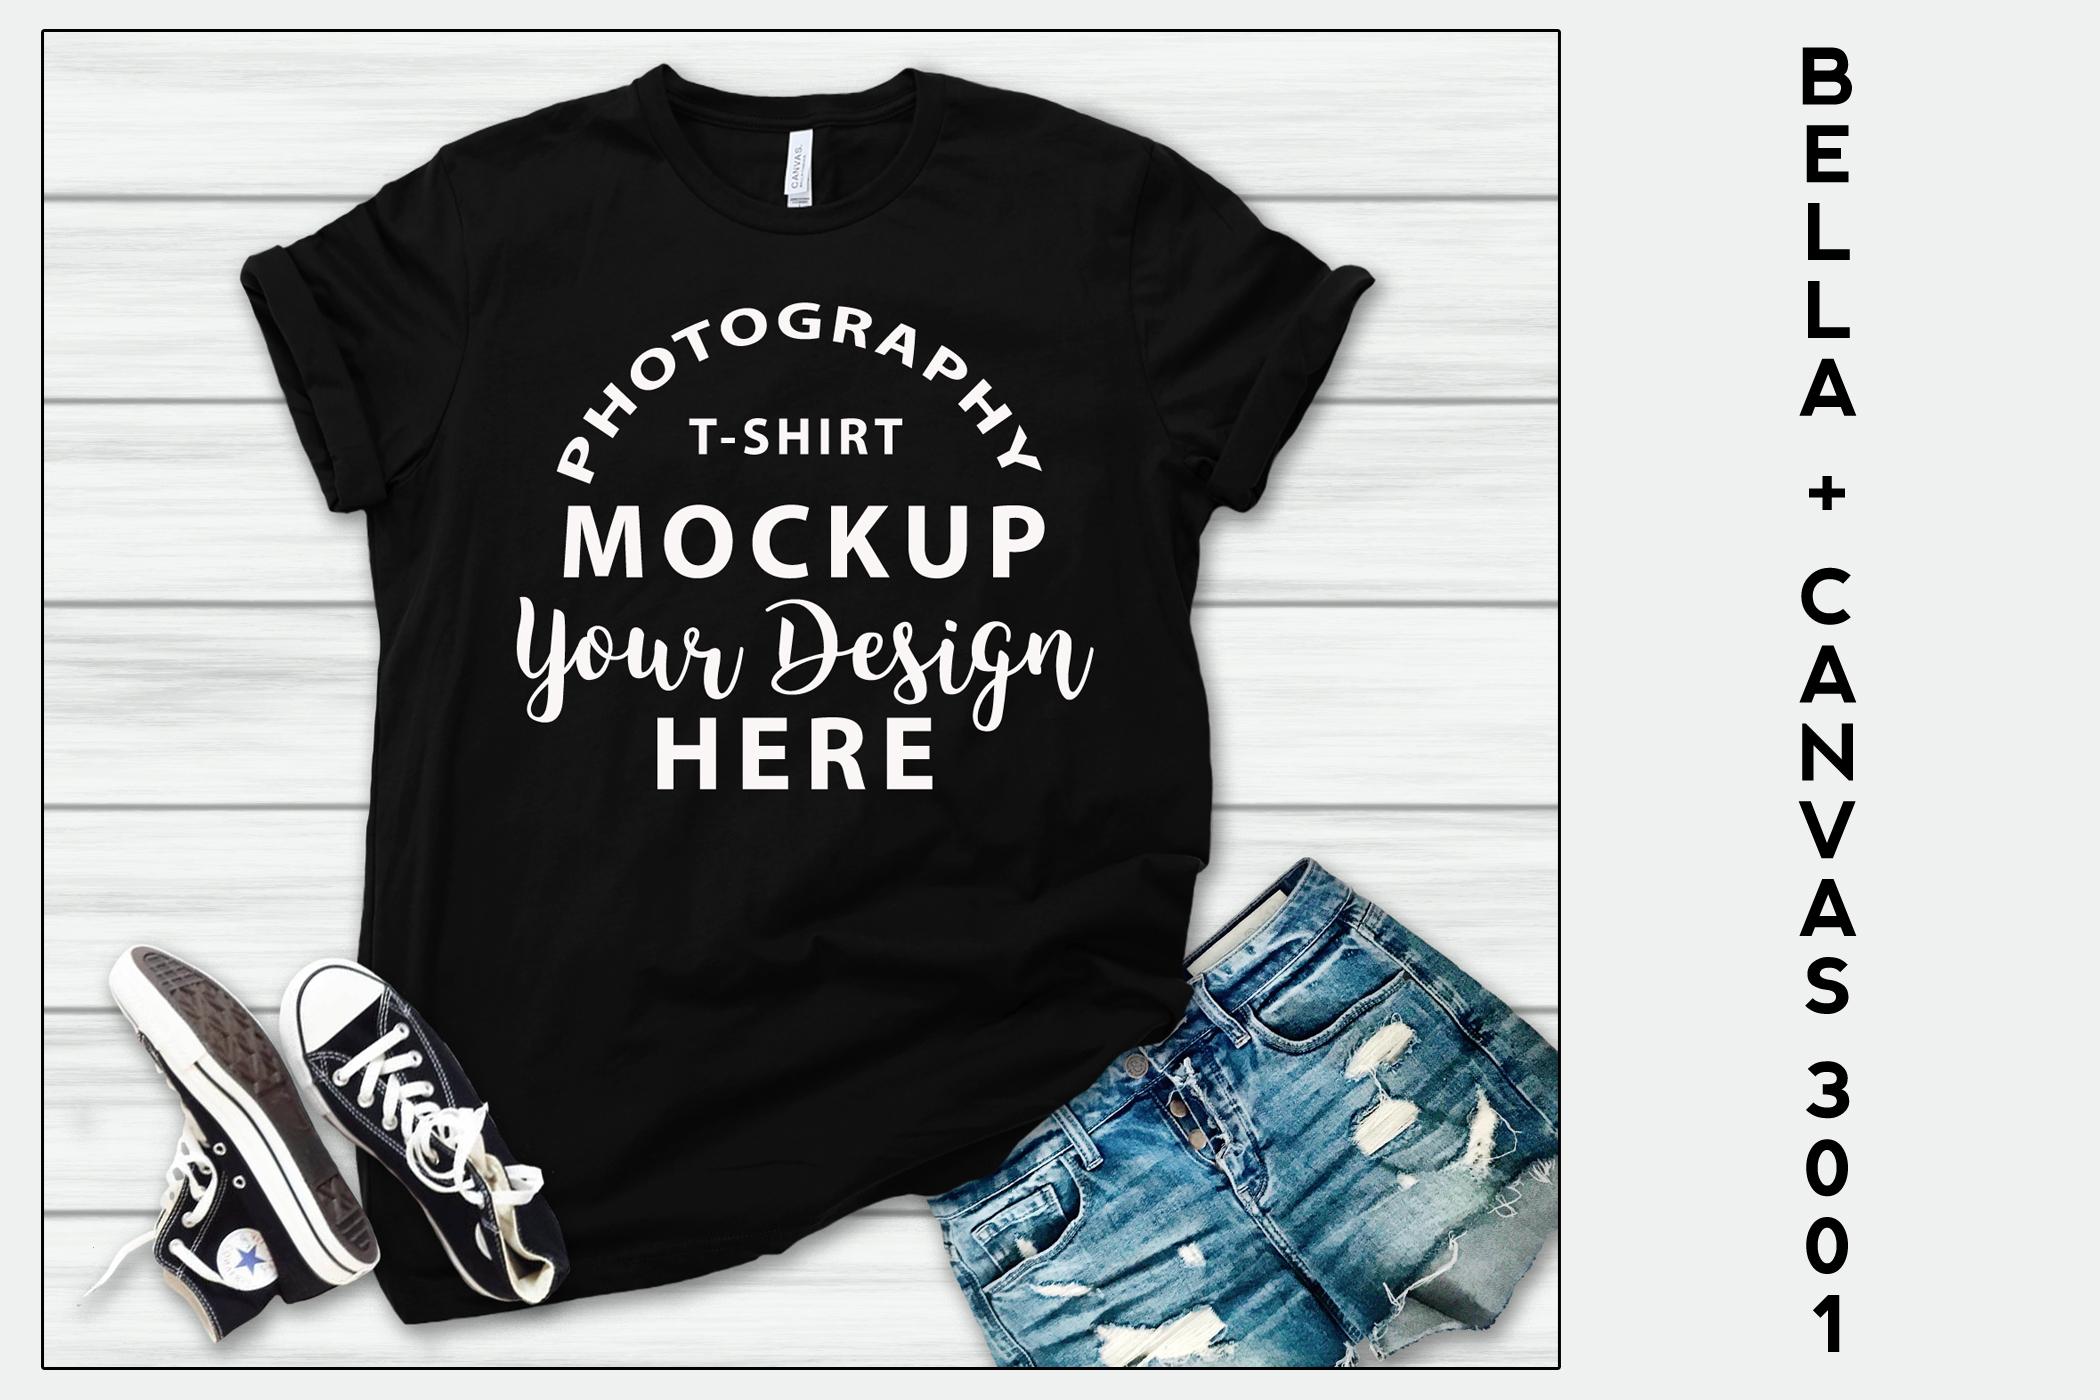 Bella Canvas 3001 T-shirt mock-up, color BLACK example image 1